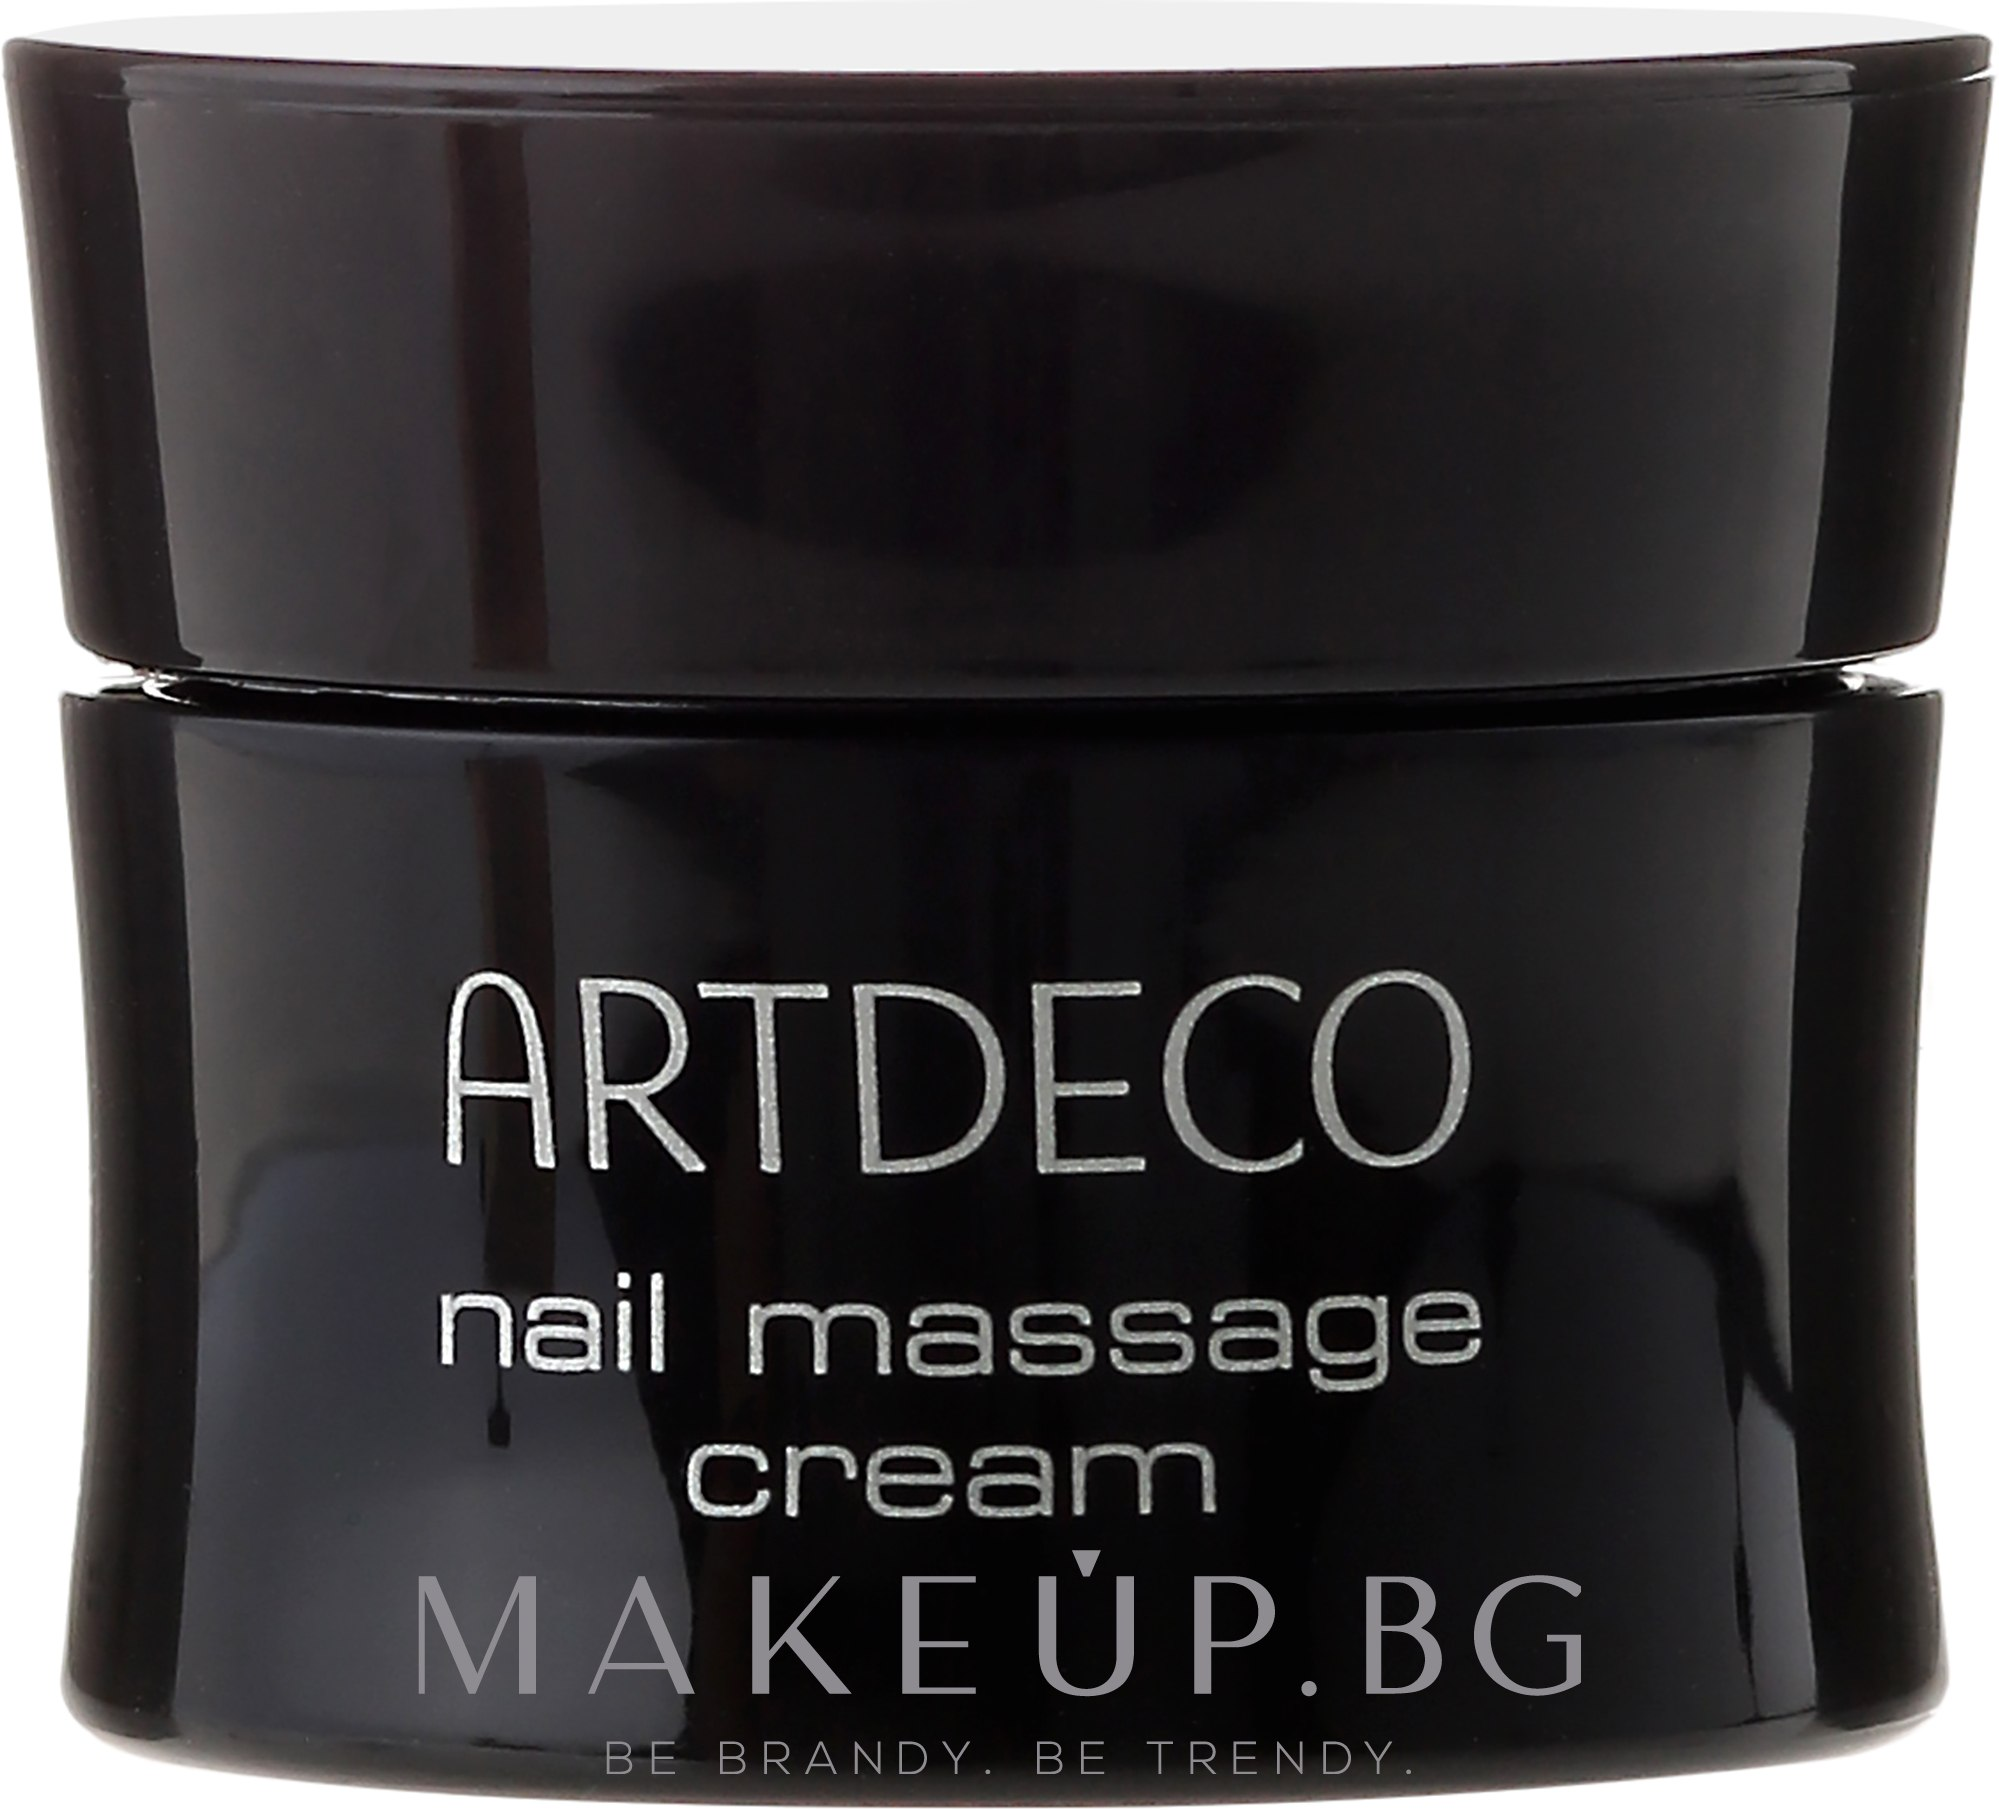 Масажен крем за нокти с напукани и сухи кутикули - Artdeco Nail Massage Cream — снимка 17 ml